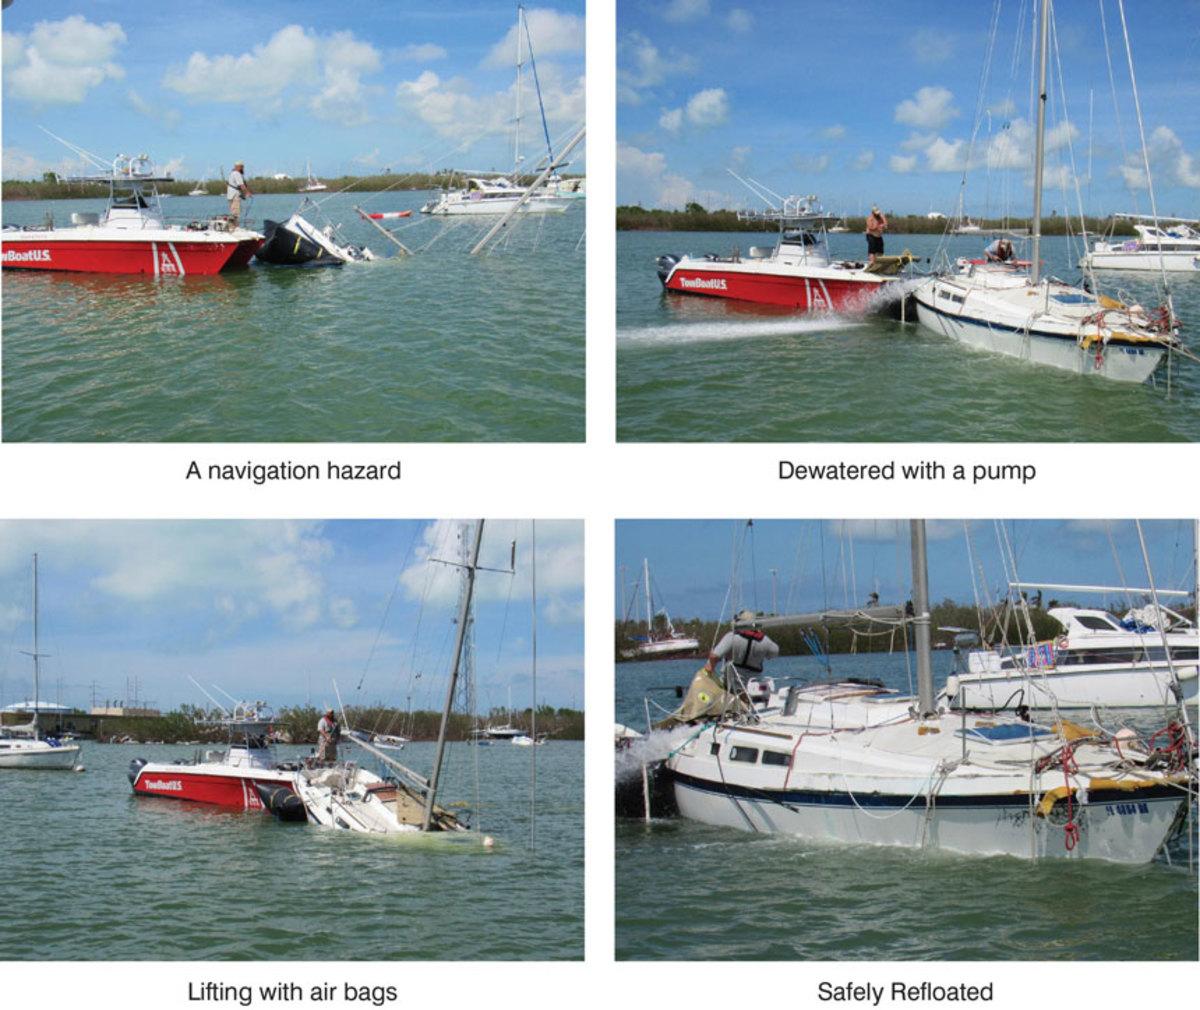 In Marathon's Boot Key Harbor, salvage crews from TowBoatUS Marathon raise a sunken sailboat and navigation hazard off the bottom.